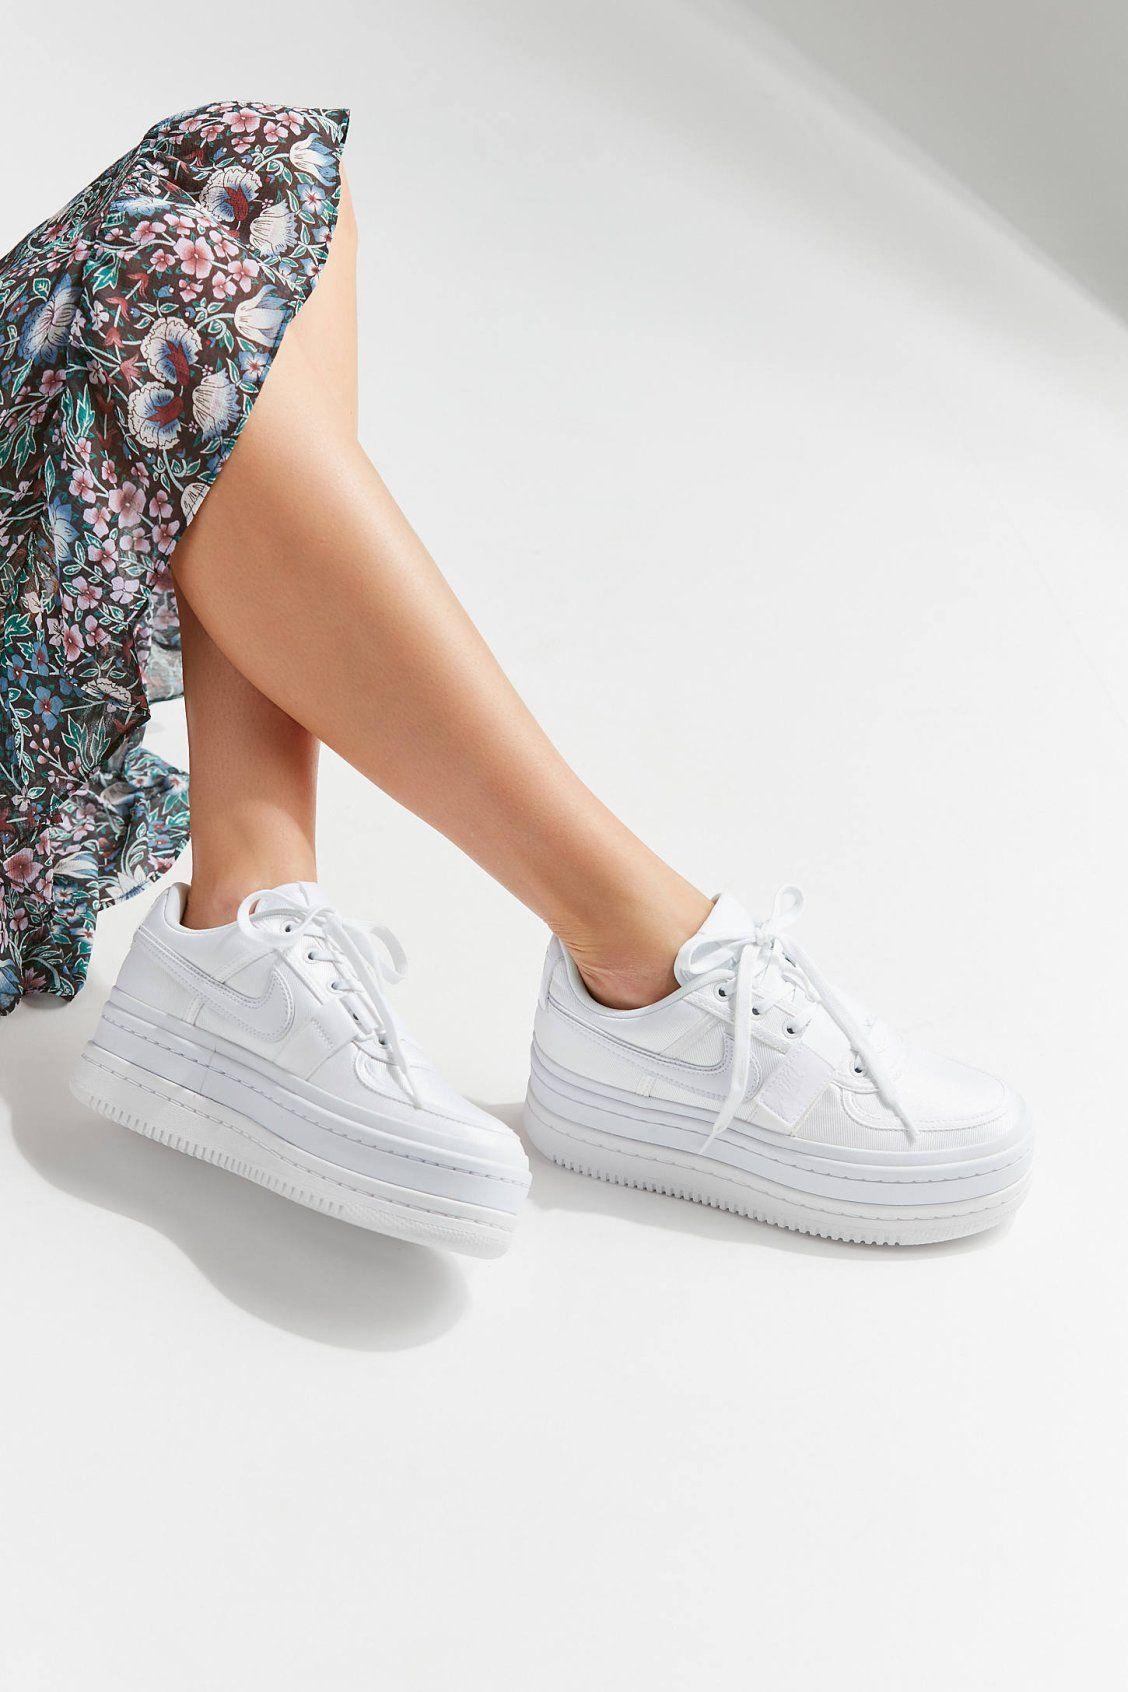 85be543855c8 Nike Vandal 2k Sneaker